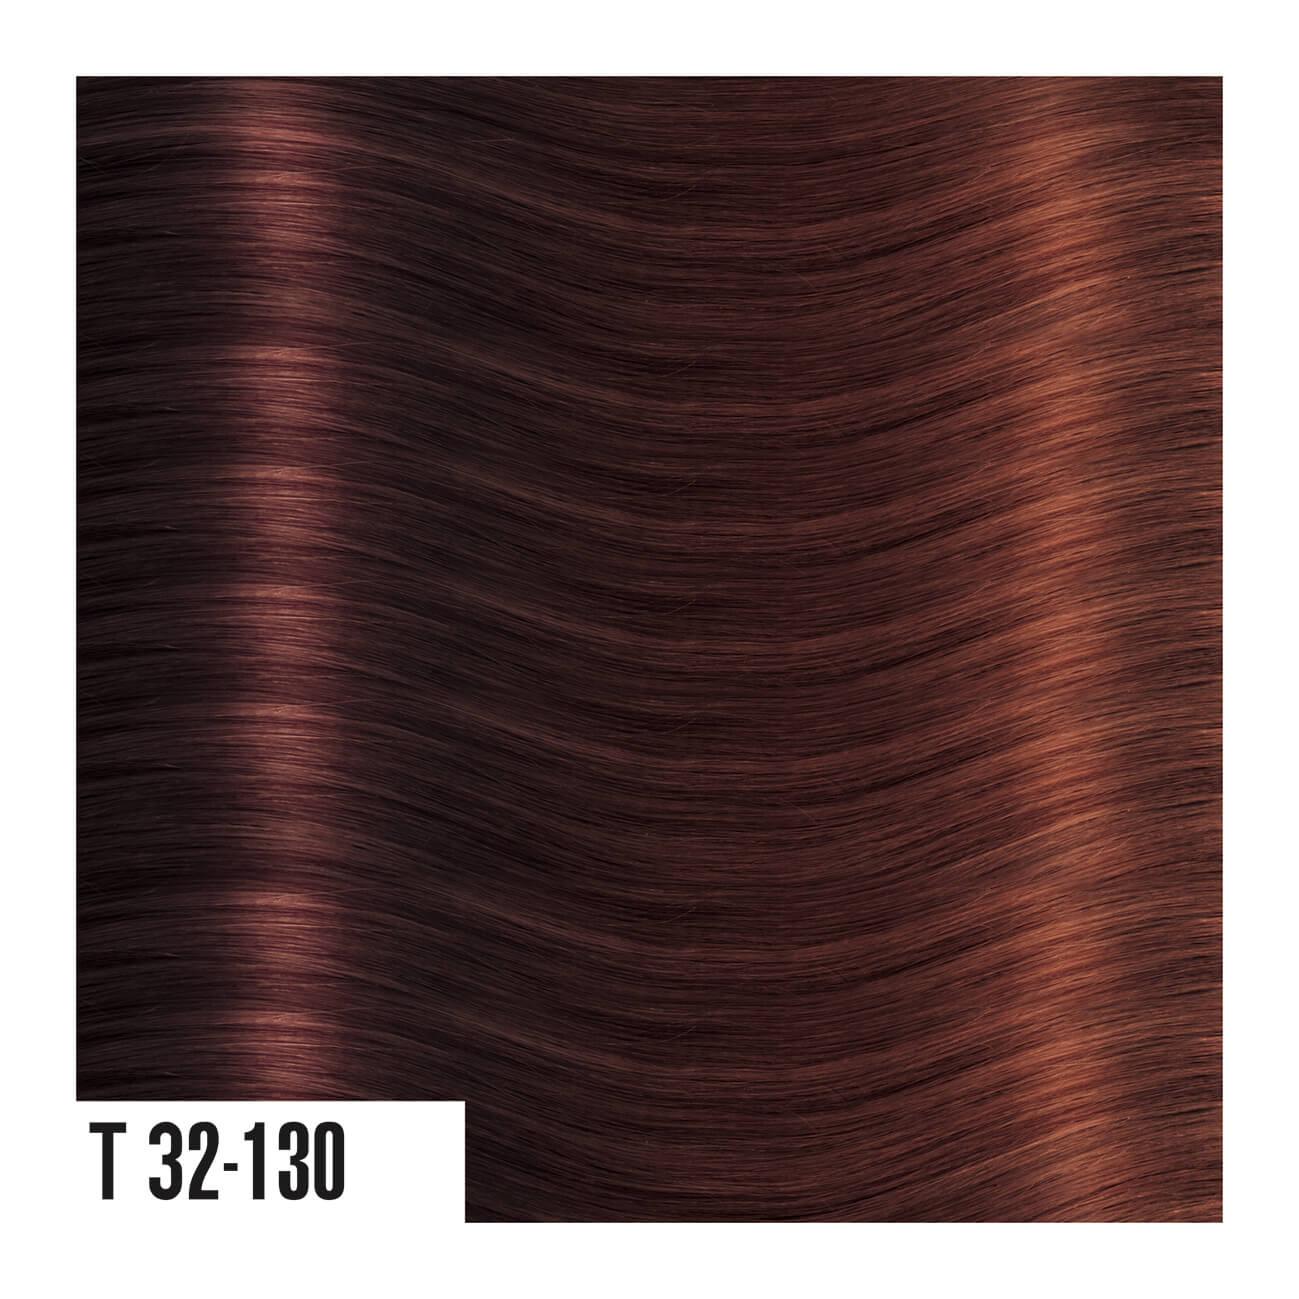 T32-130